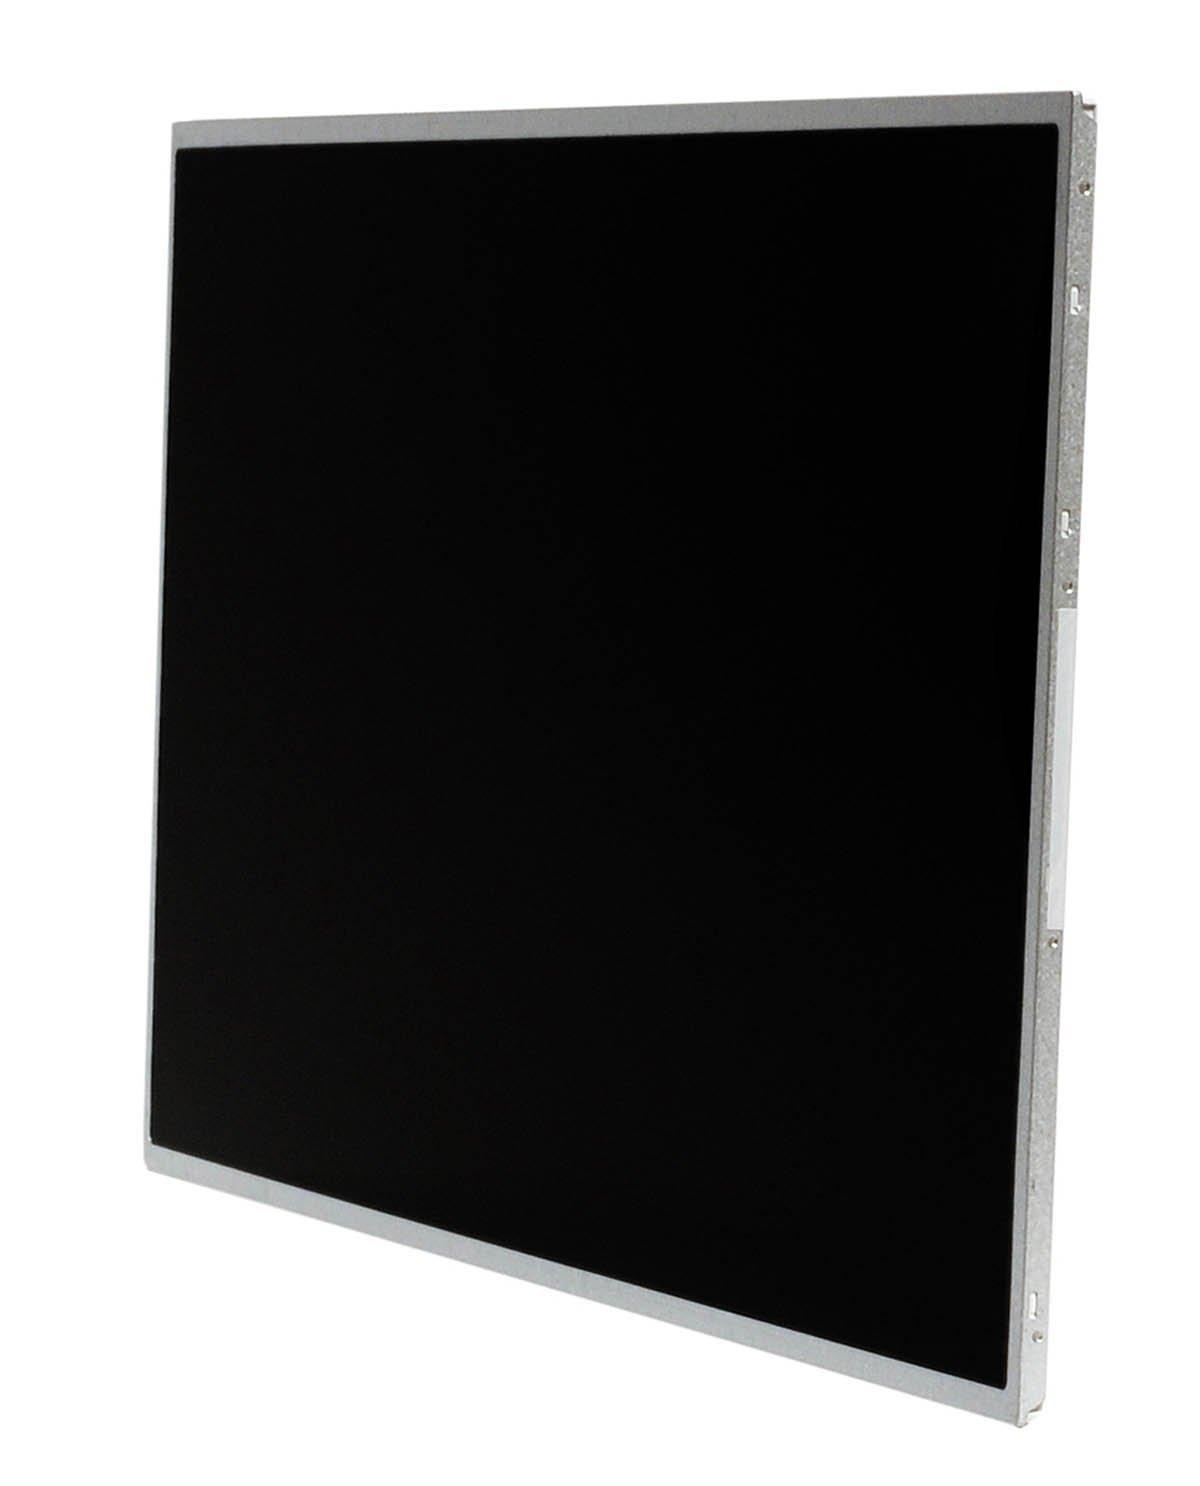 NEW 15.6 FOR HP 2000-2B49WM, 2000-2B89WM, 2000-BF59WM LED HD Laptop LCD Screen